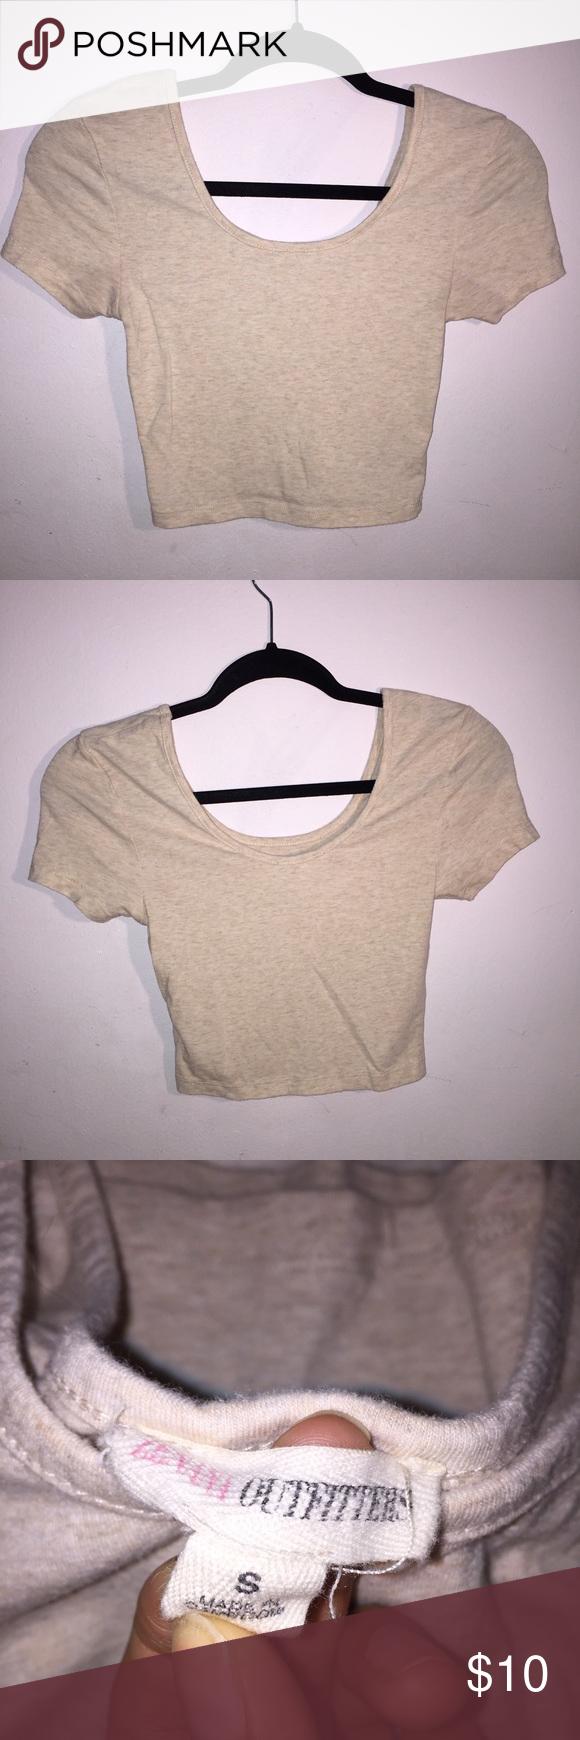 ☀️CROP TOP☀️ Tan, crop top!! Good condition, worn a few times! Tops Crop Tops